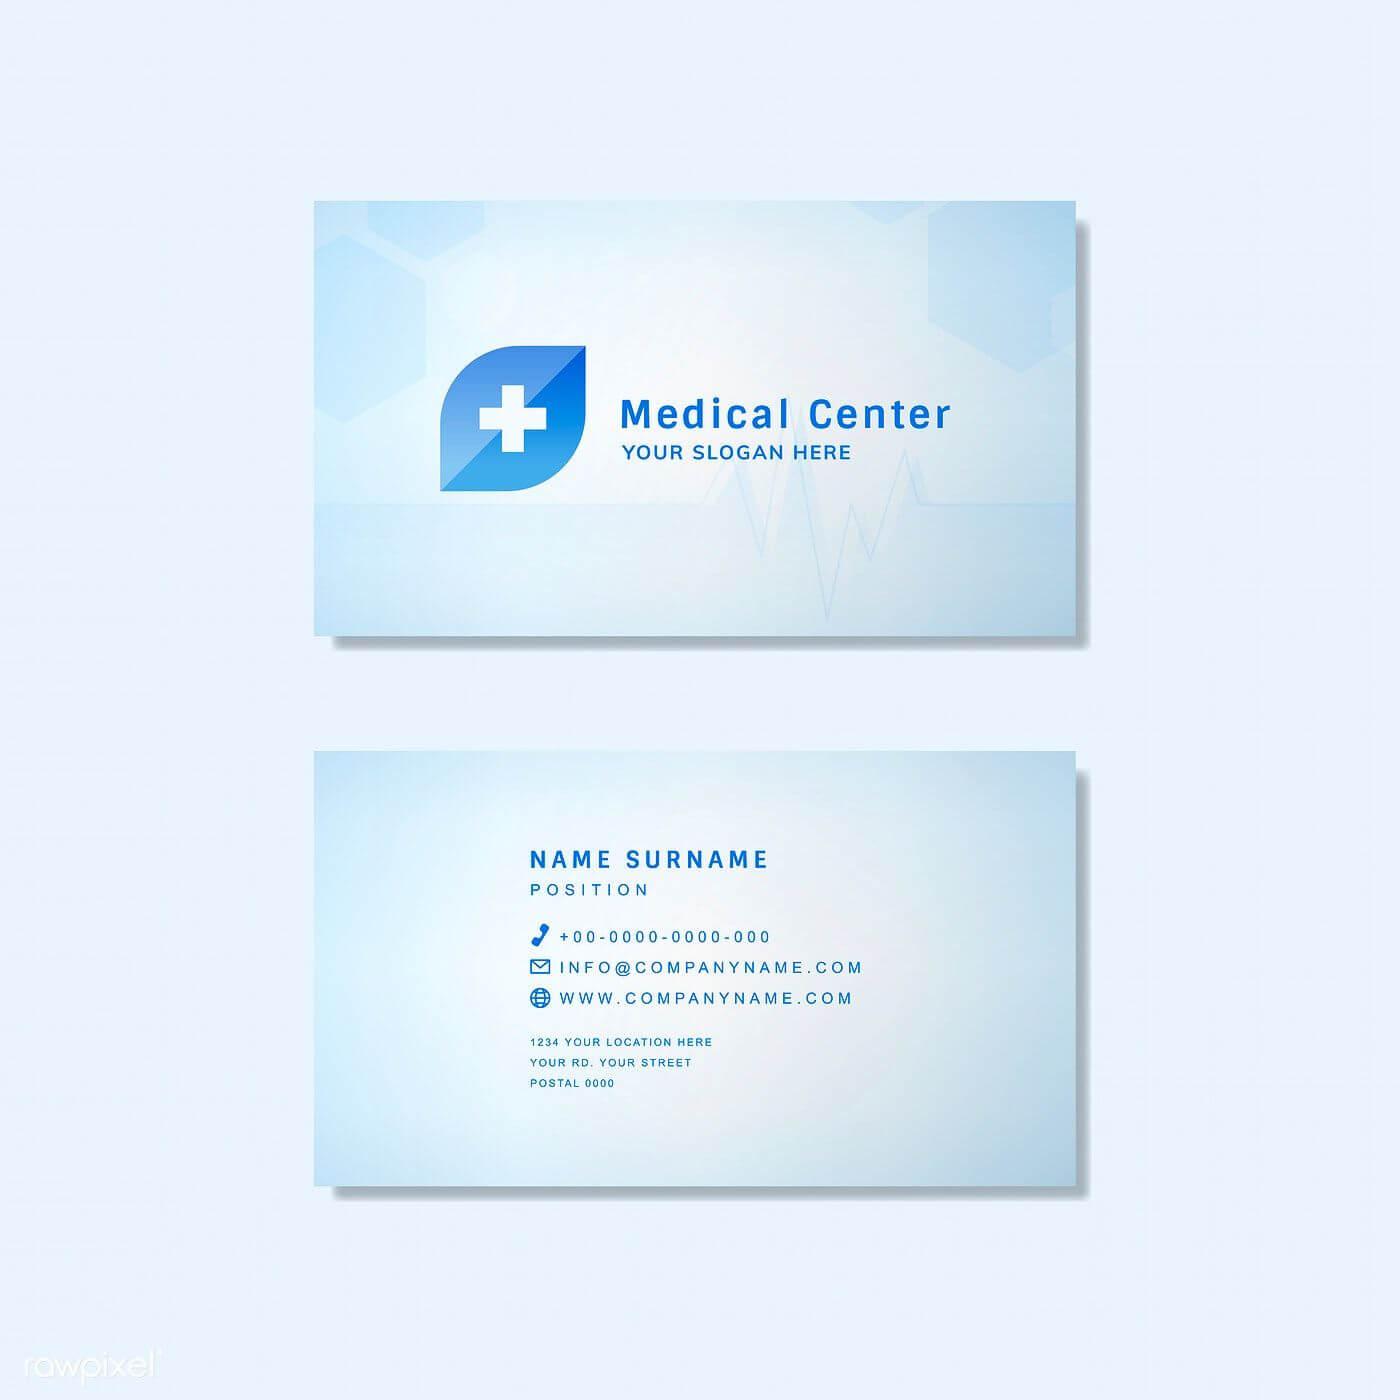 Medical Professional Business Card Design Mockup | Free With Medical Business Cards Templates Free